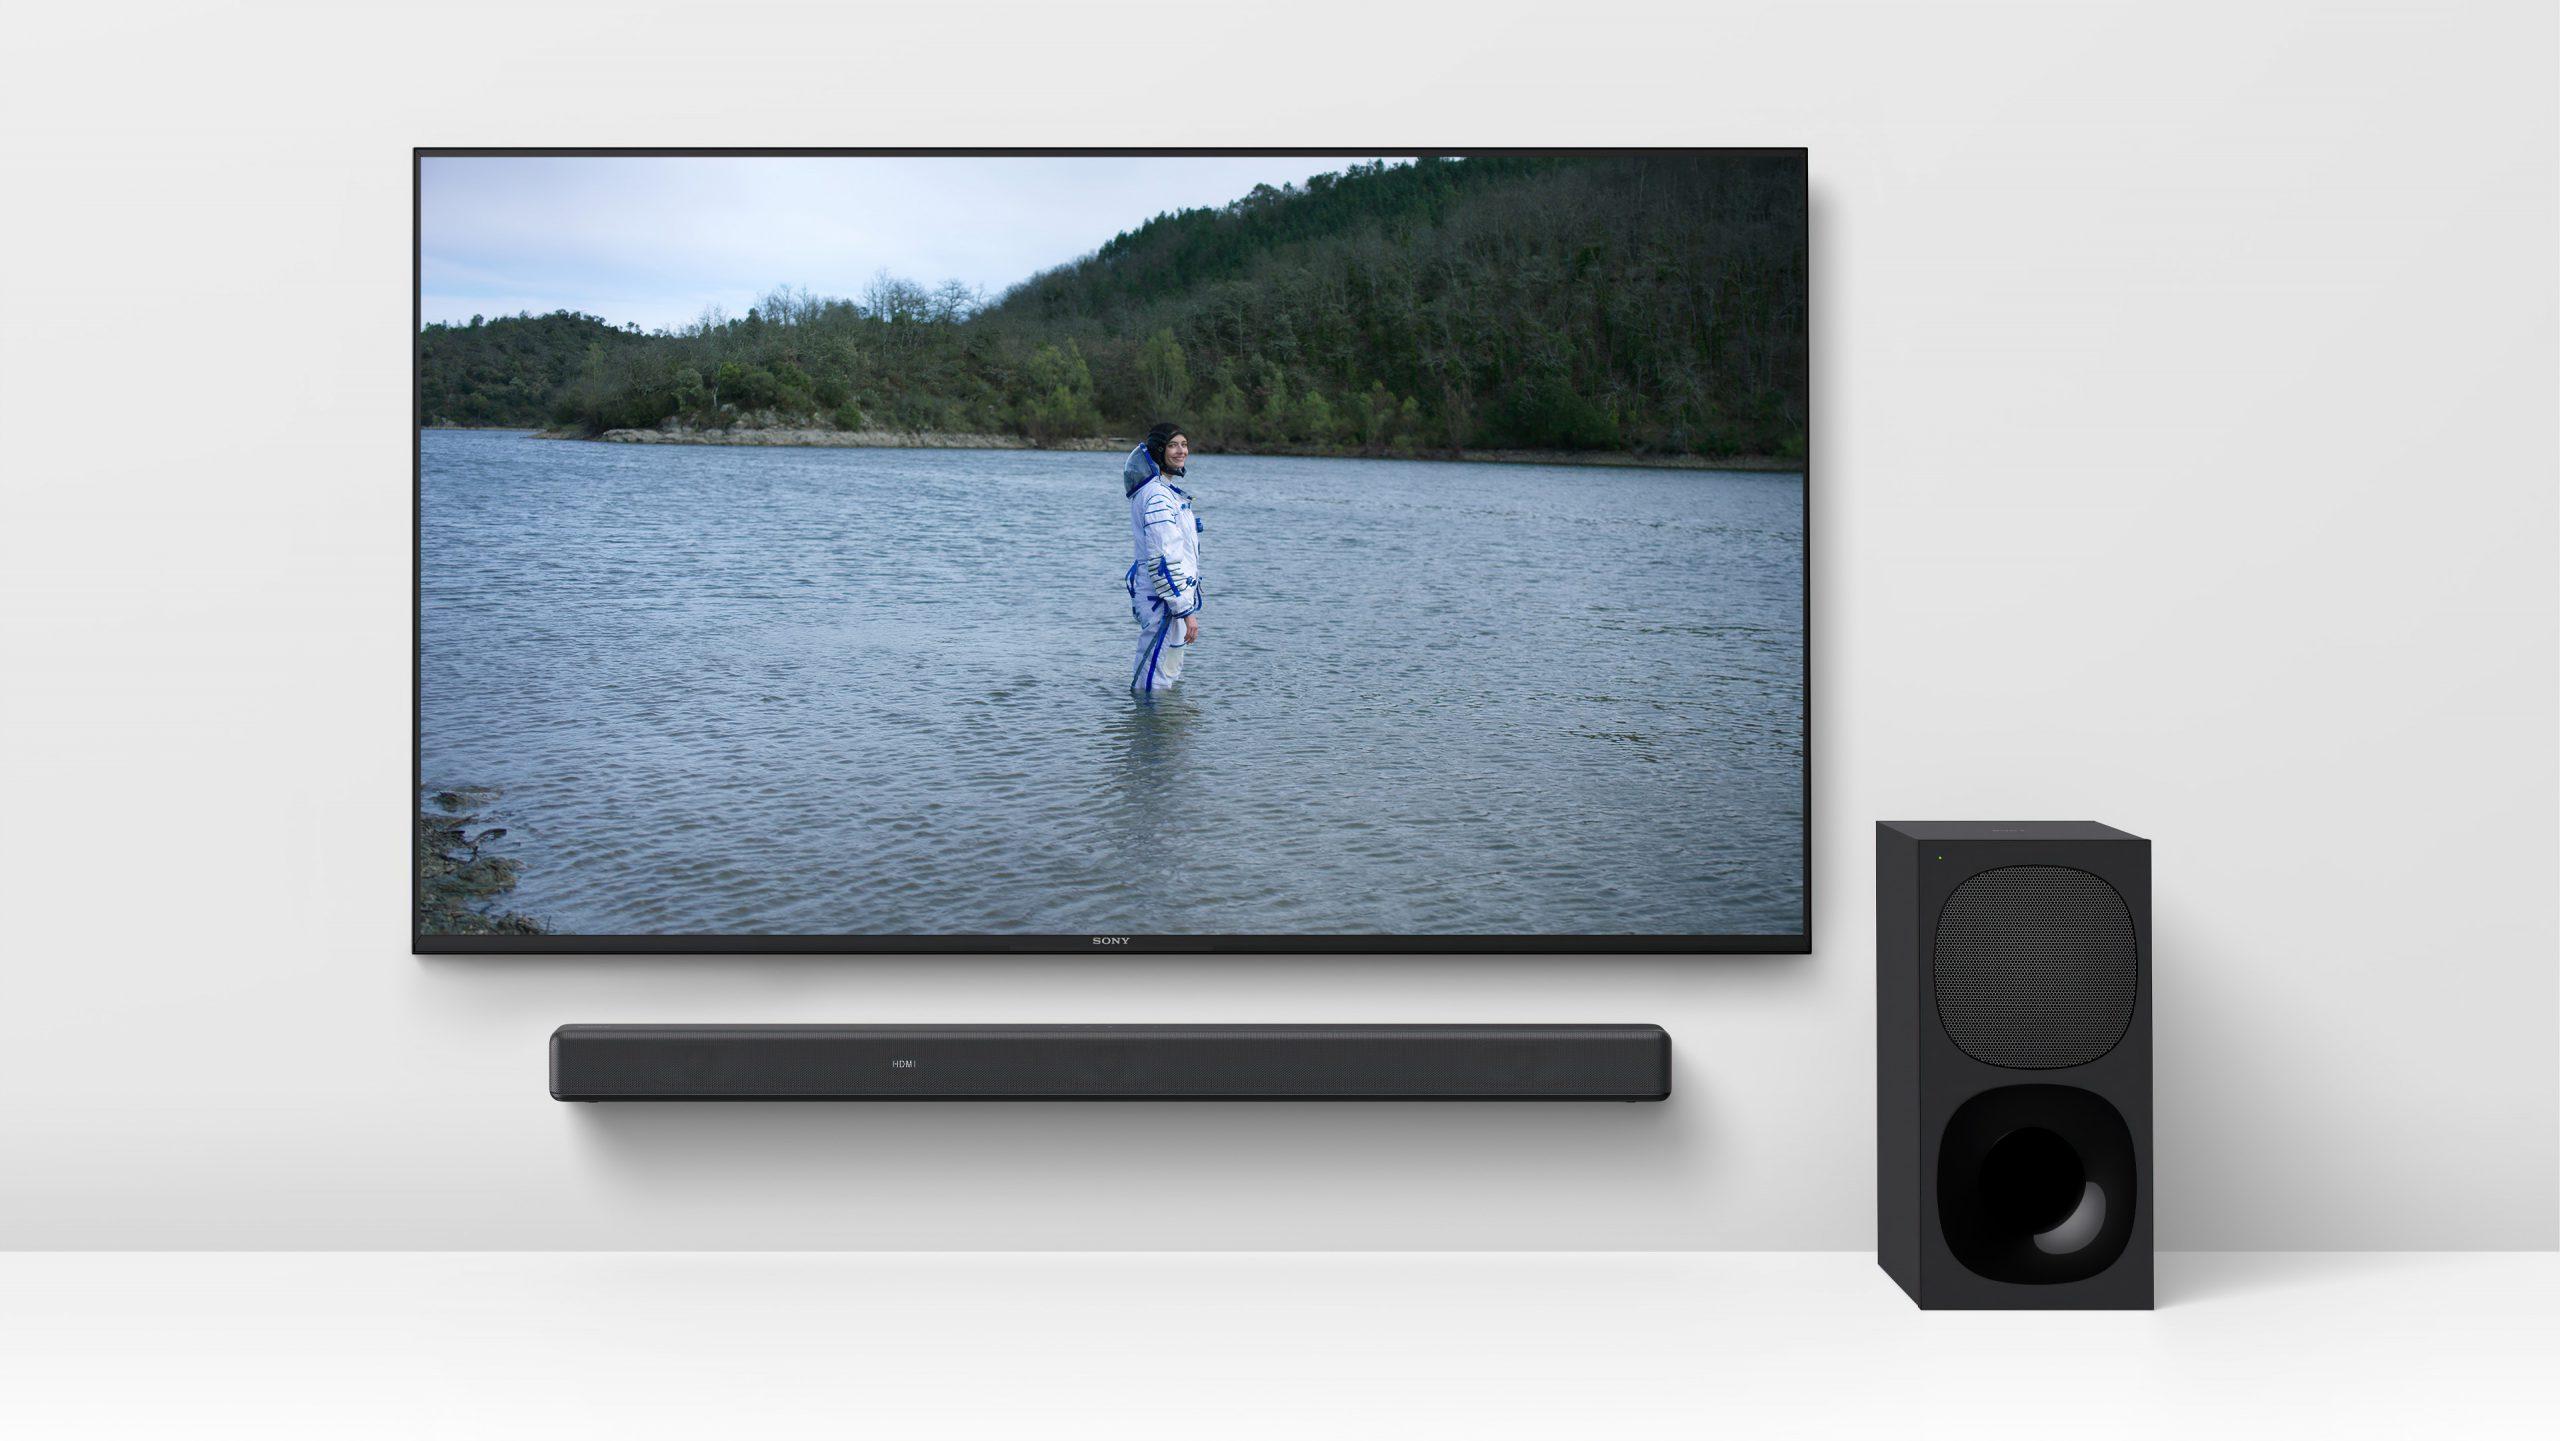 Sony HT-G700 spread